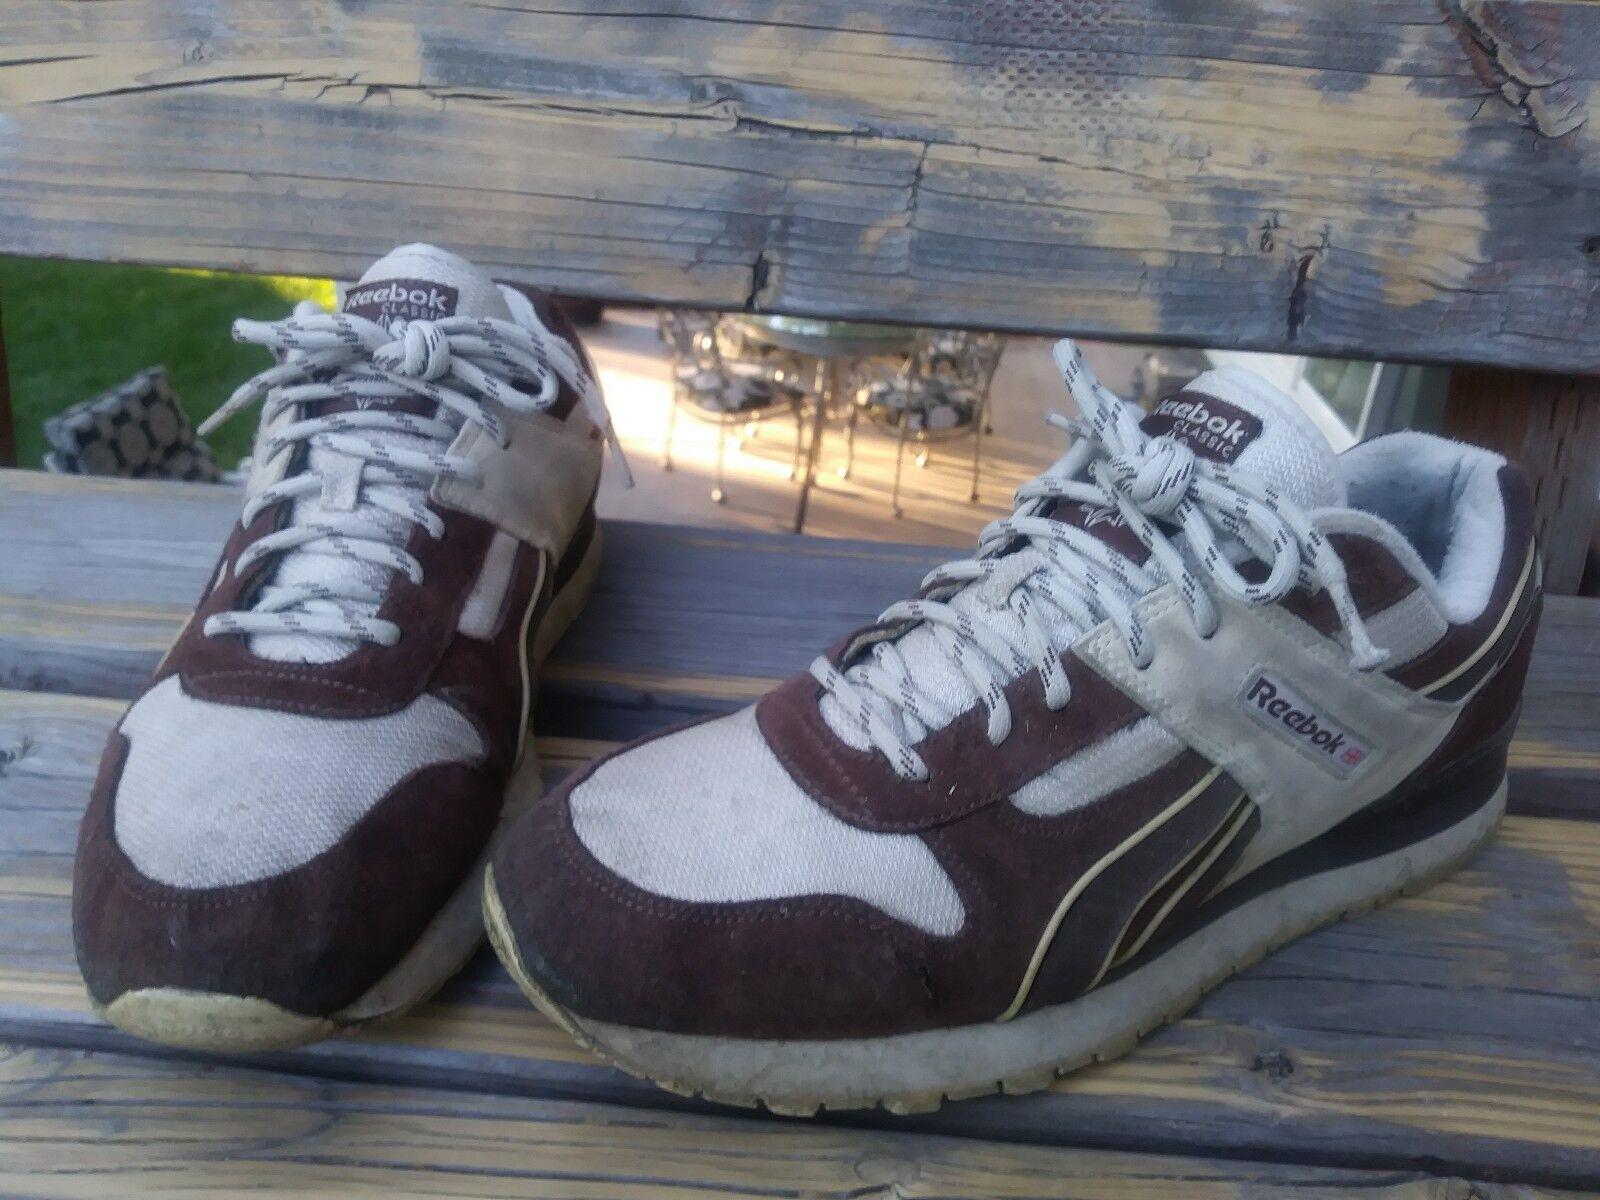 1ec8370043726 Reebok Classic Classic Classic brown mens Size 12 vintage FREE SHIPPING  PUMP QUESTION f87e8a